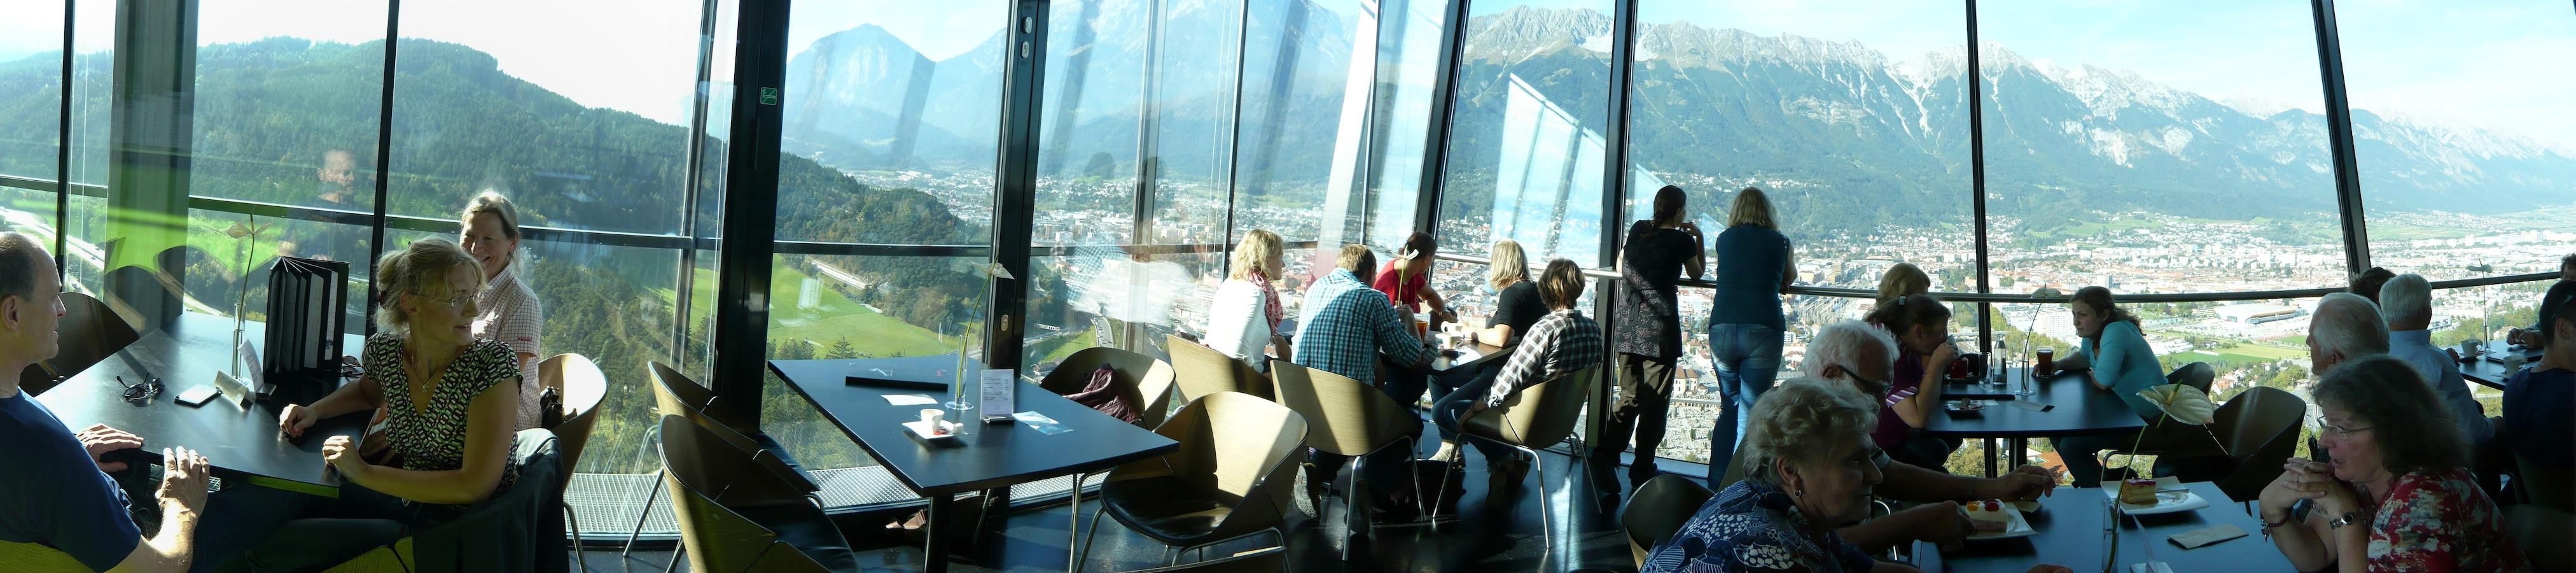 Panorama-Restaurant der Bergisel-Schanze